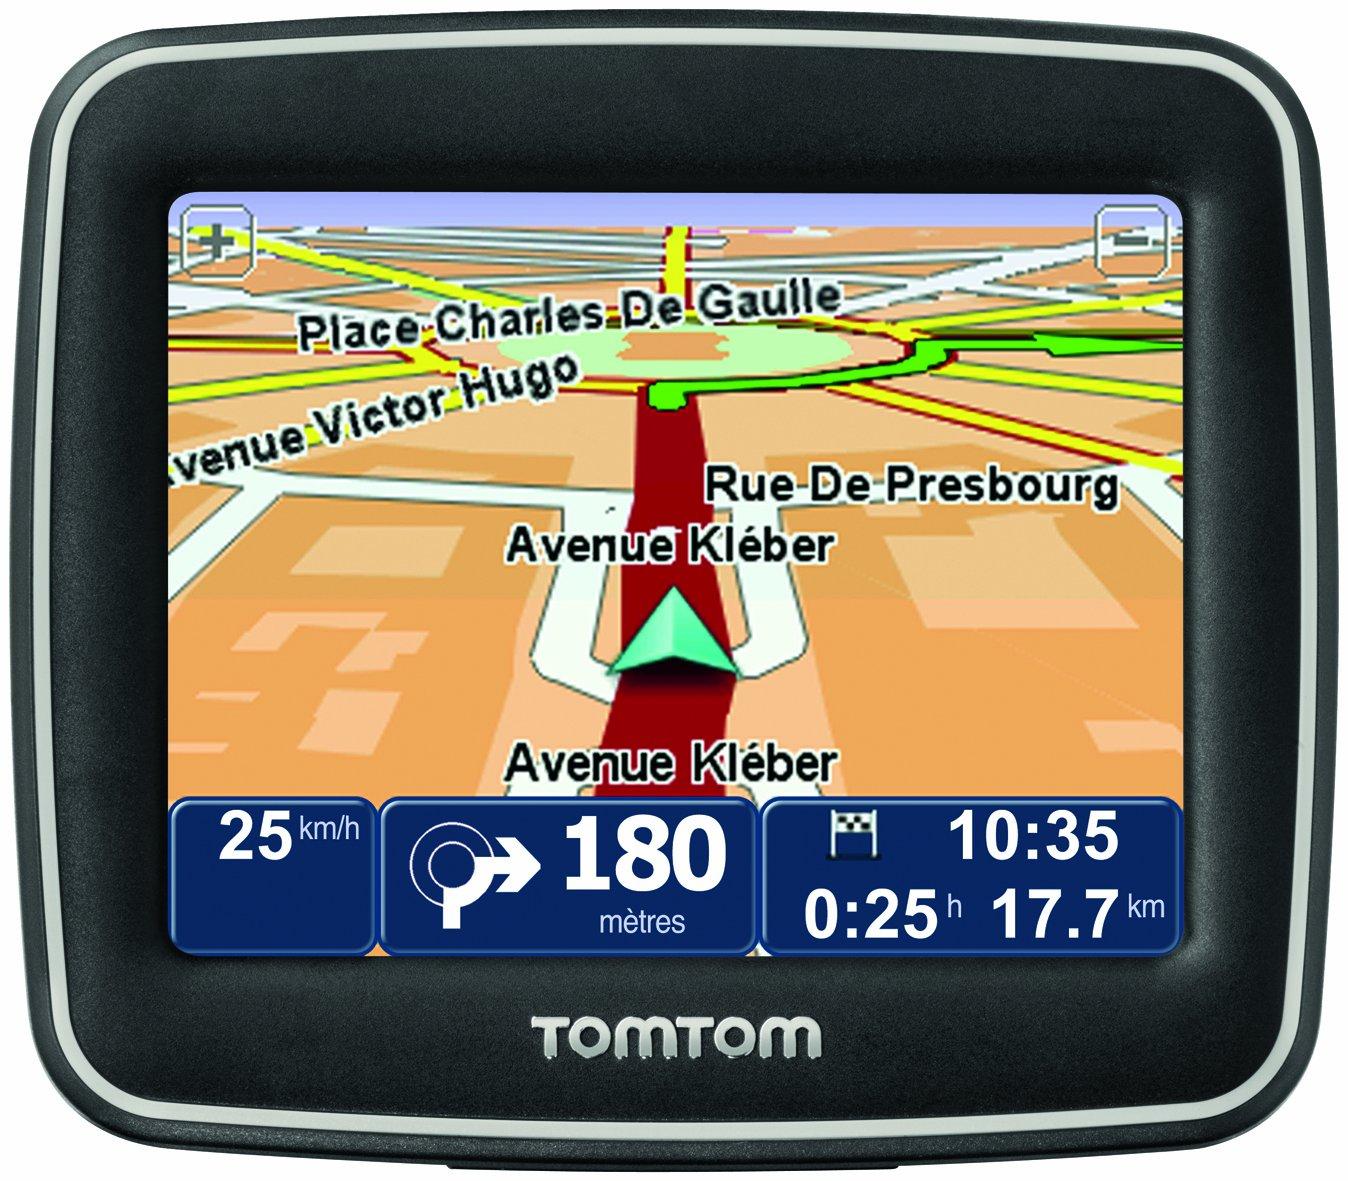 TomTom Start 3.5' Sat Nav with Europe Maps Start Europe - Black B002MZZXGC 1 1EX 1EX0 1EX0002 1EX000201 GPS Units Reference UK RoI Satellite navigation satelite